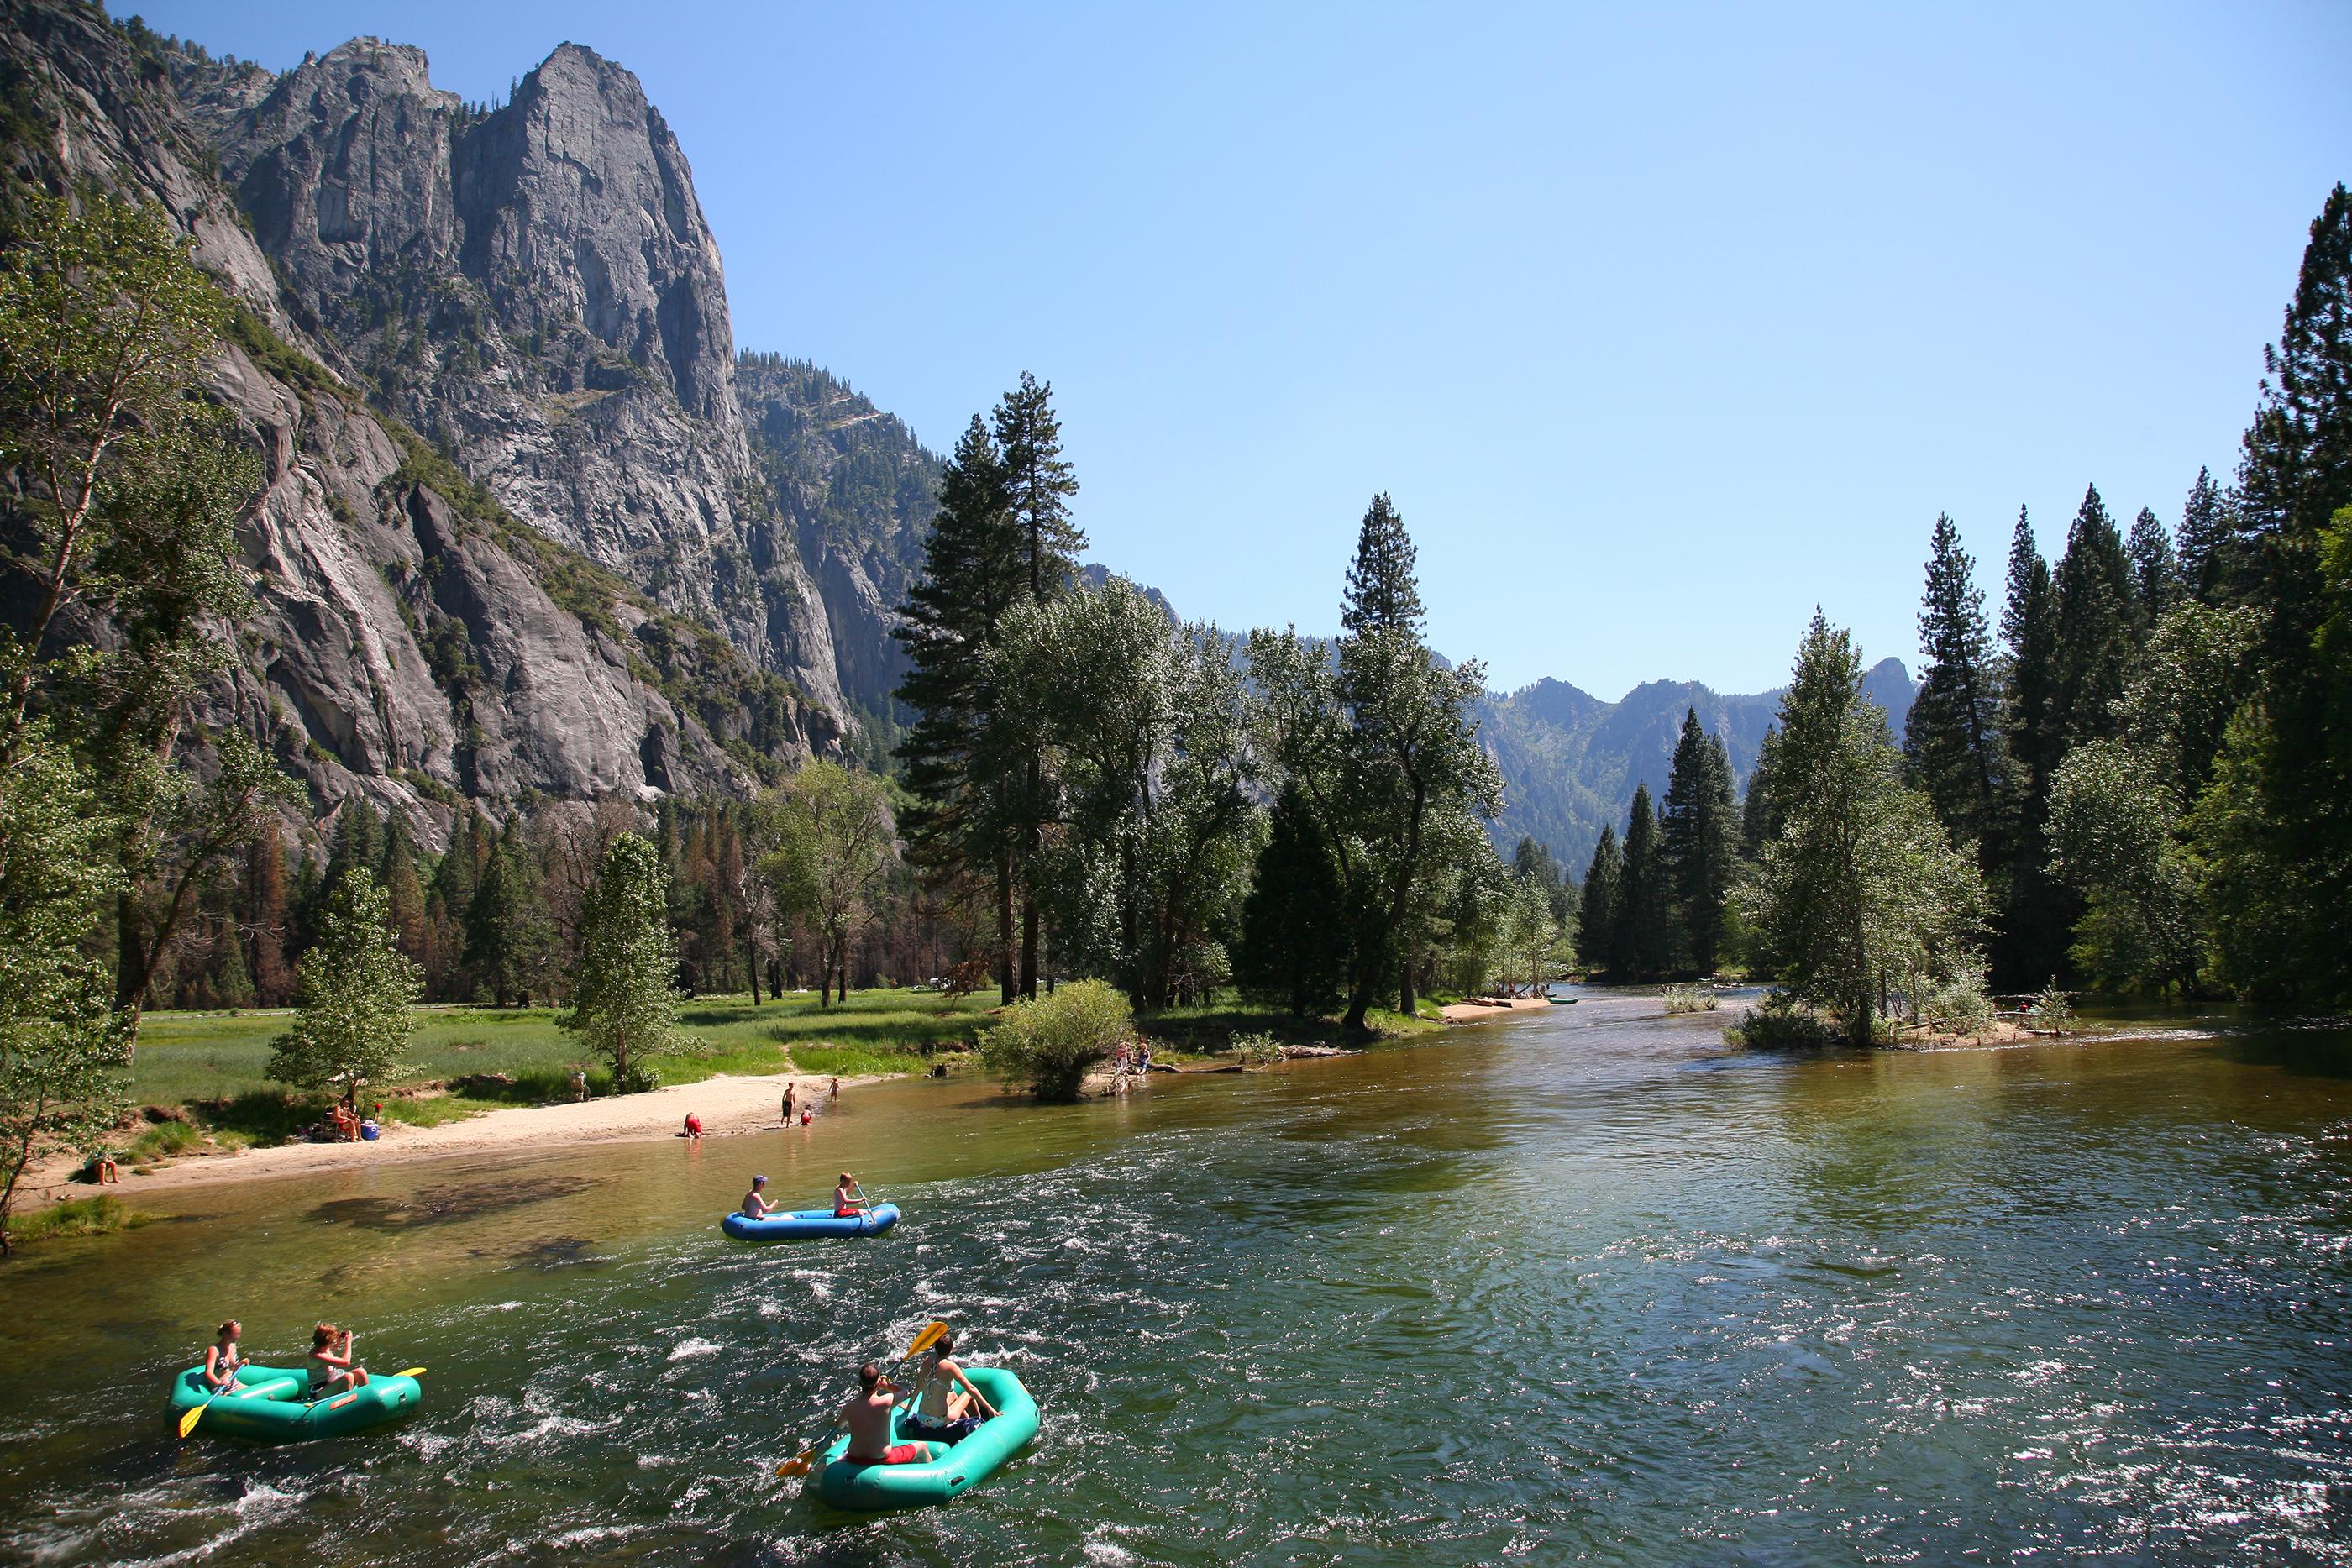 180601-best-national-parks-yosemite